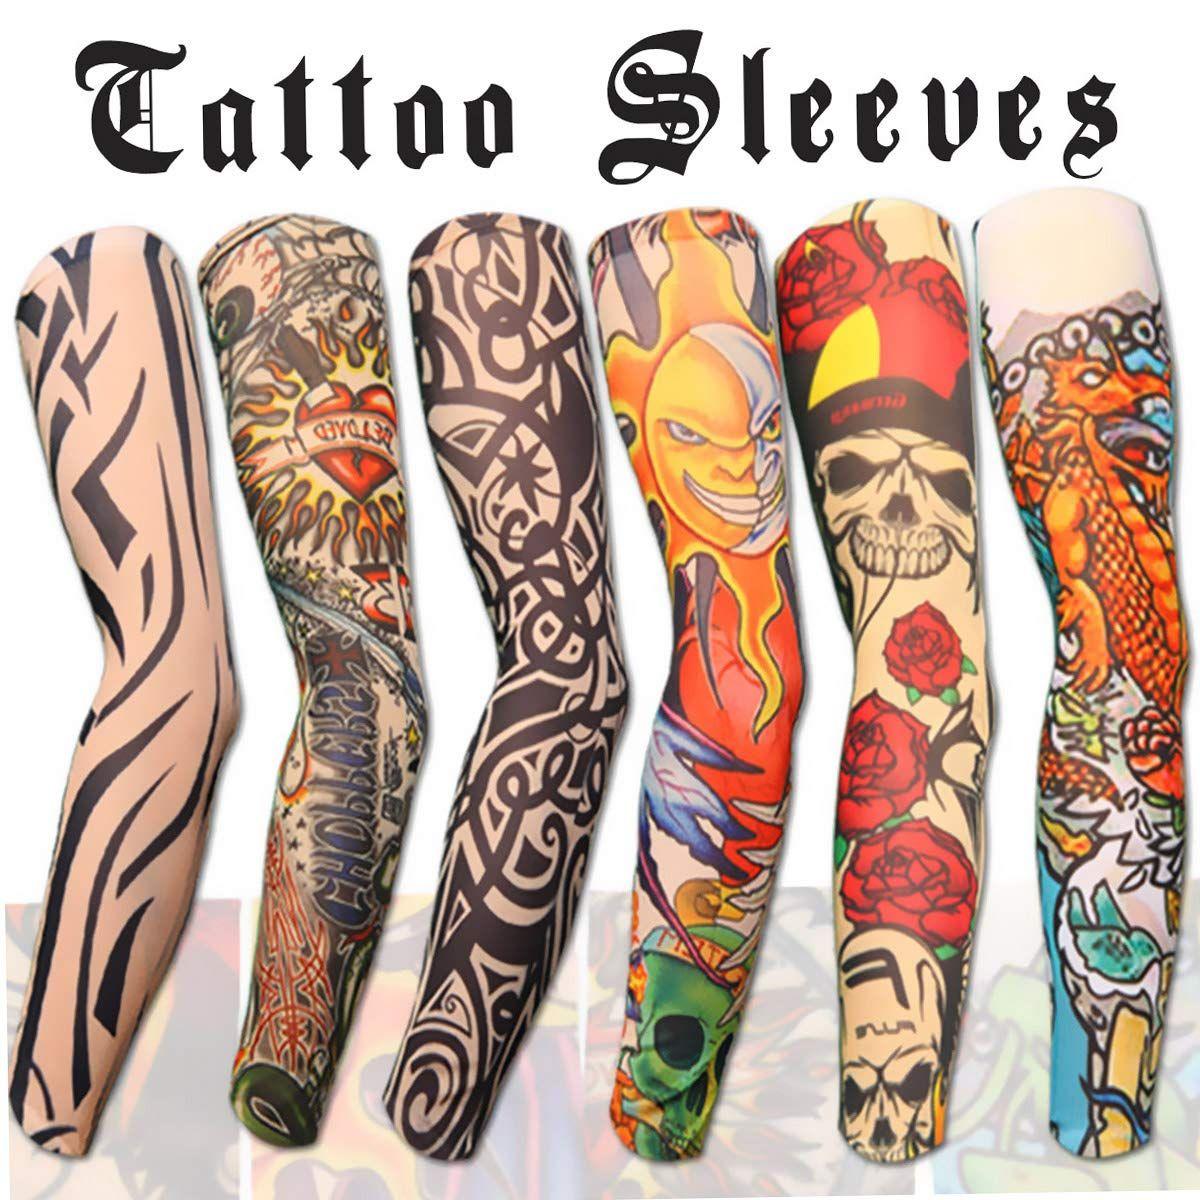 Akstore 6pcs Set Arts Fake Temporary Tattoo Arm Sunscreen